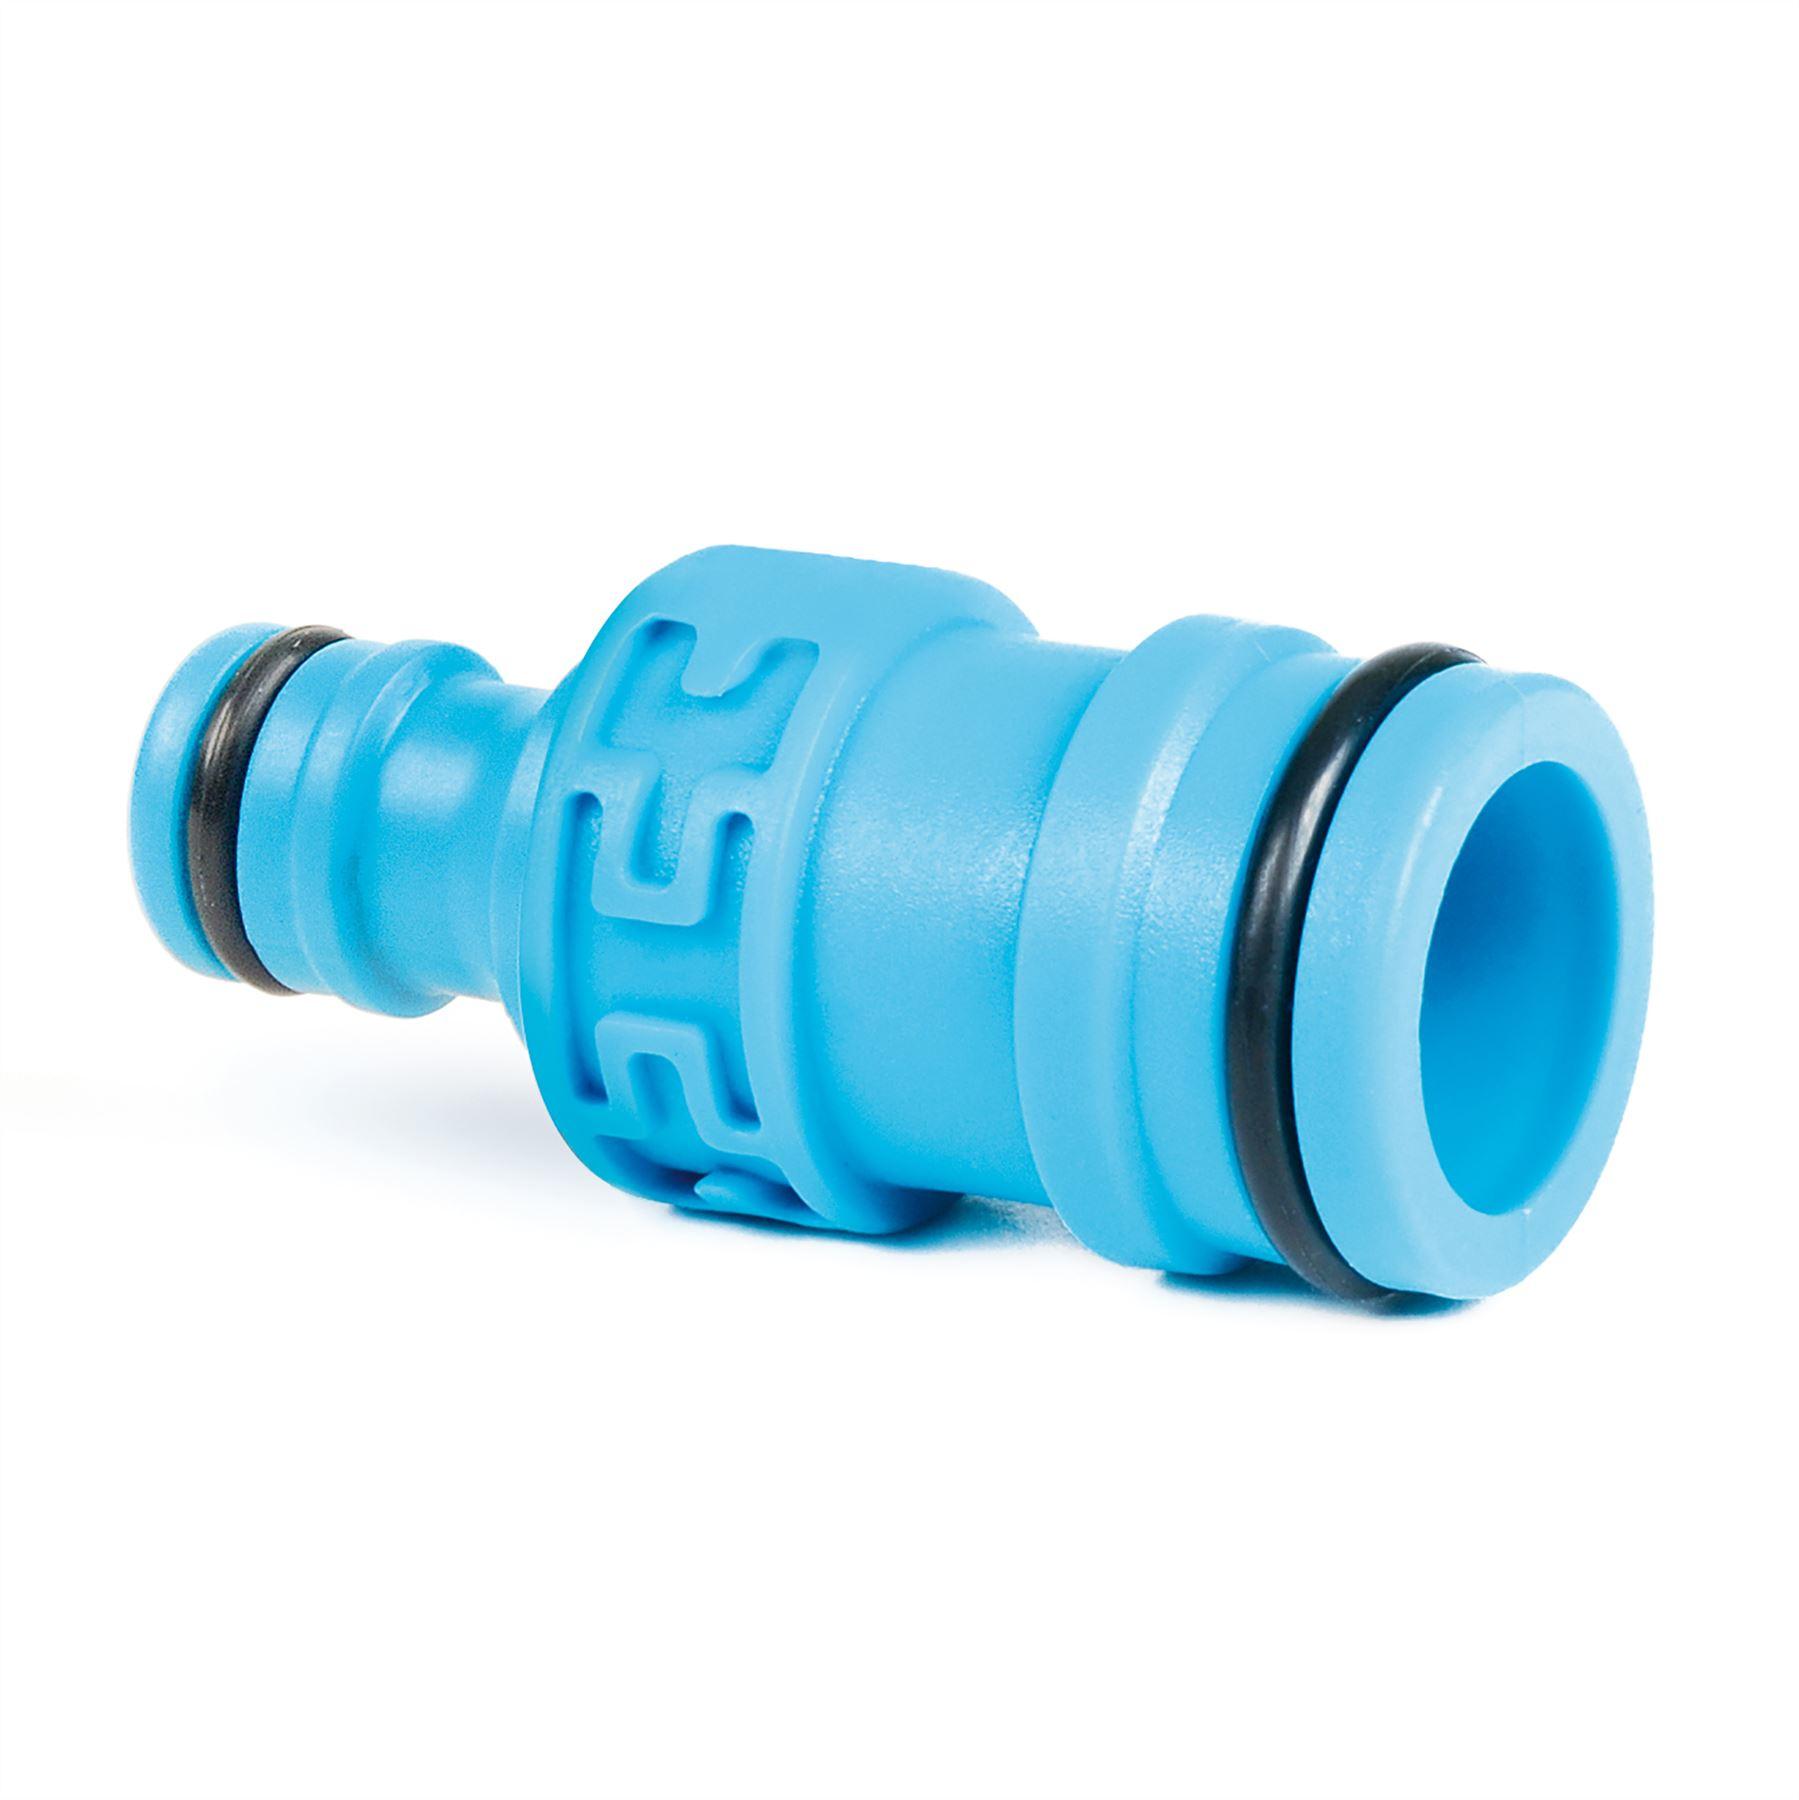 Hozelock Kompatibel 2-Way Verbindung 2.5cm > 1.9cm Reduktion ...